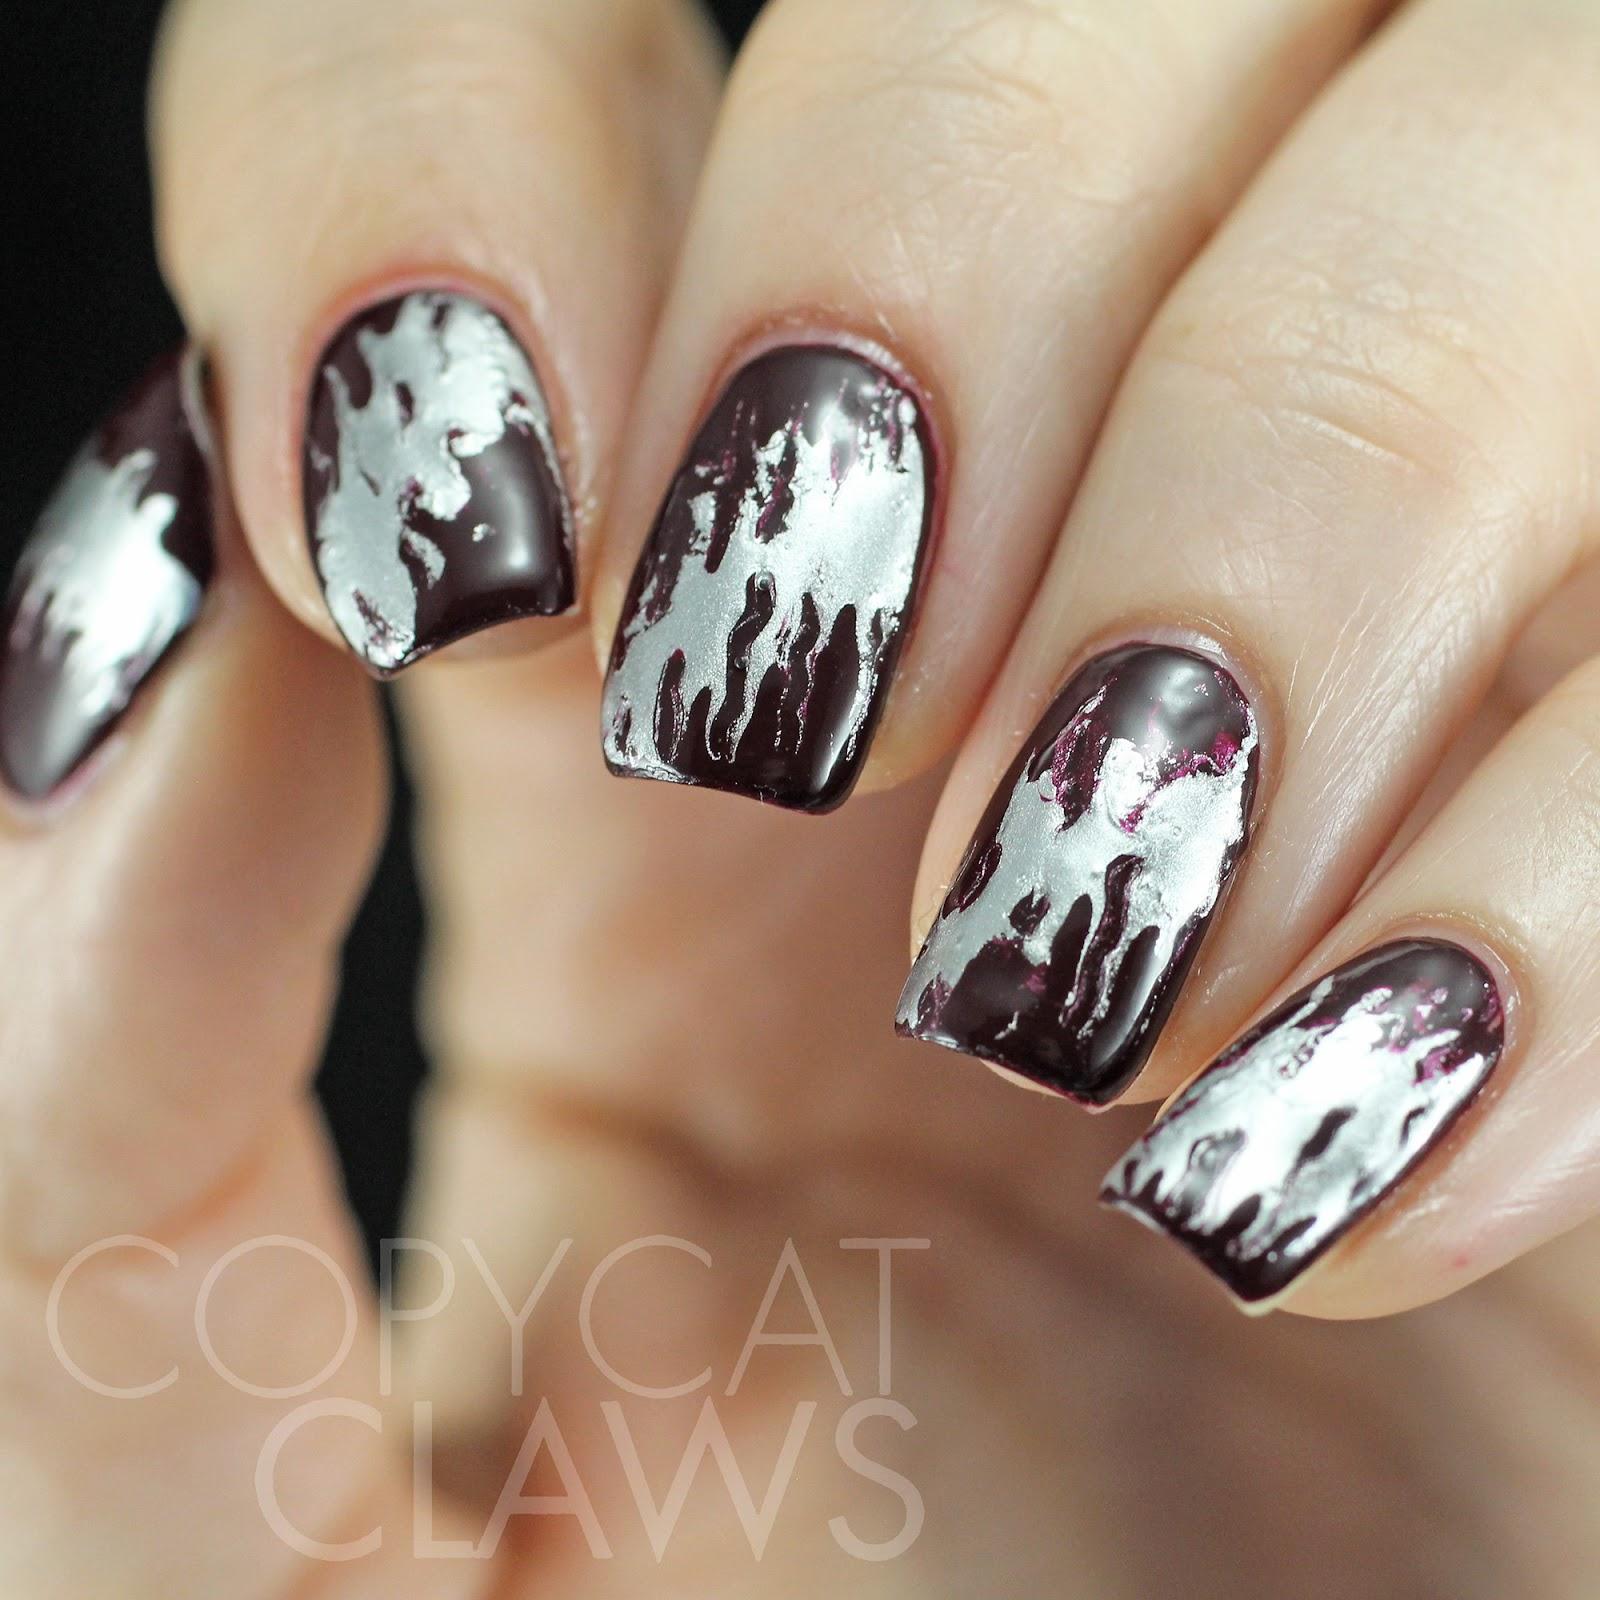 Copycat Claws Needle Drag Nail Art